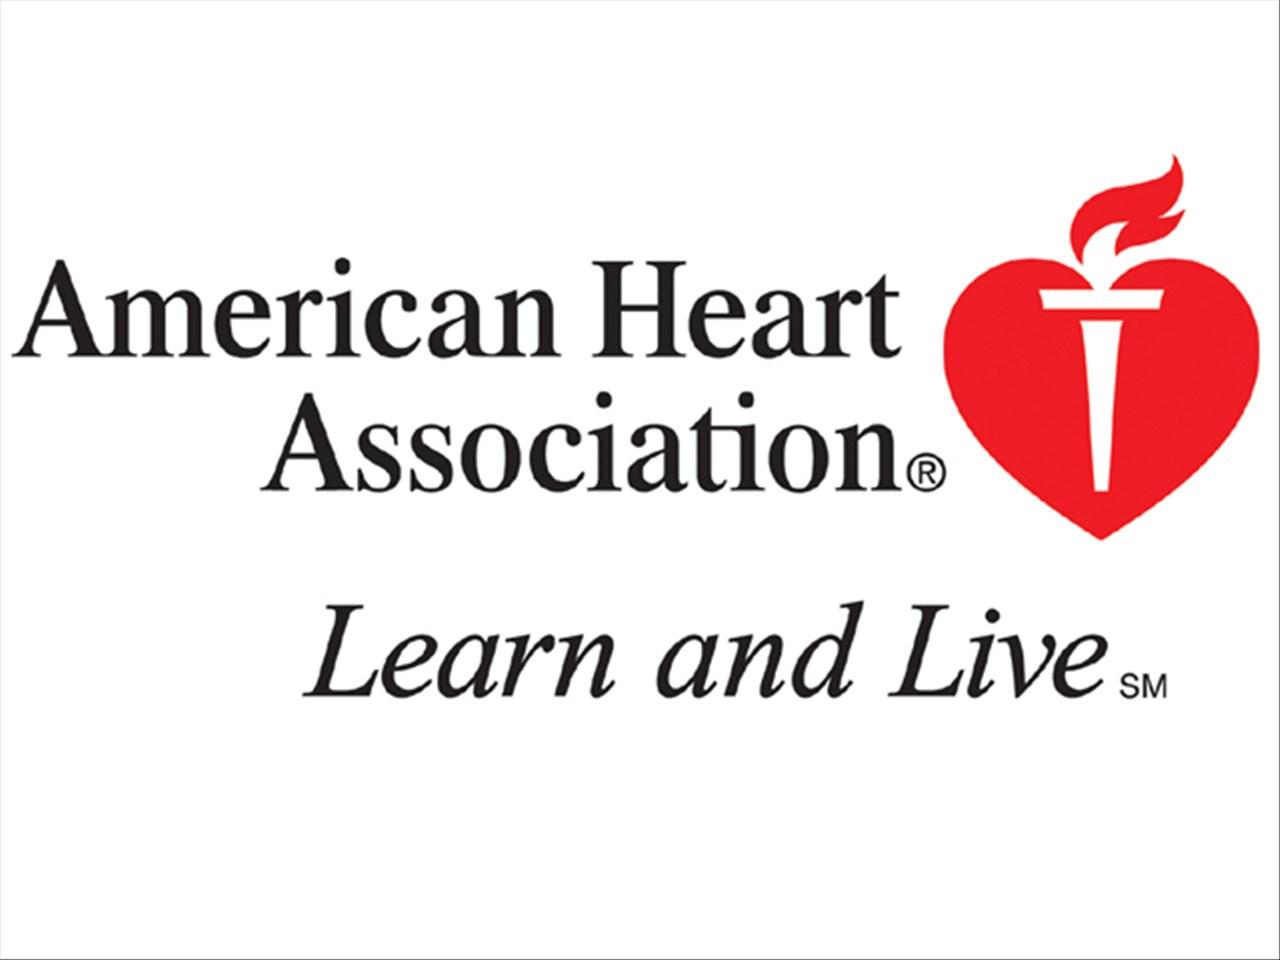 American Heart Association_1489581204094.jpg